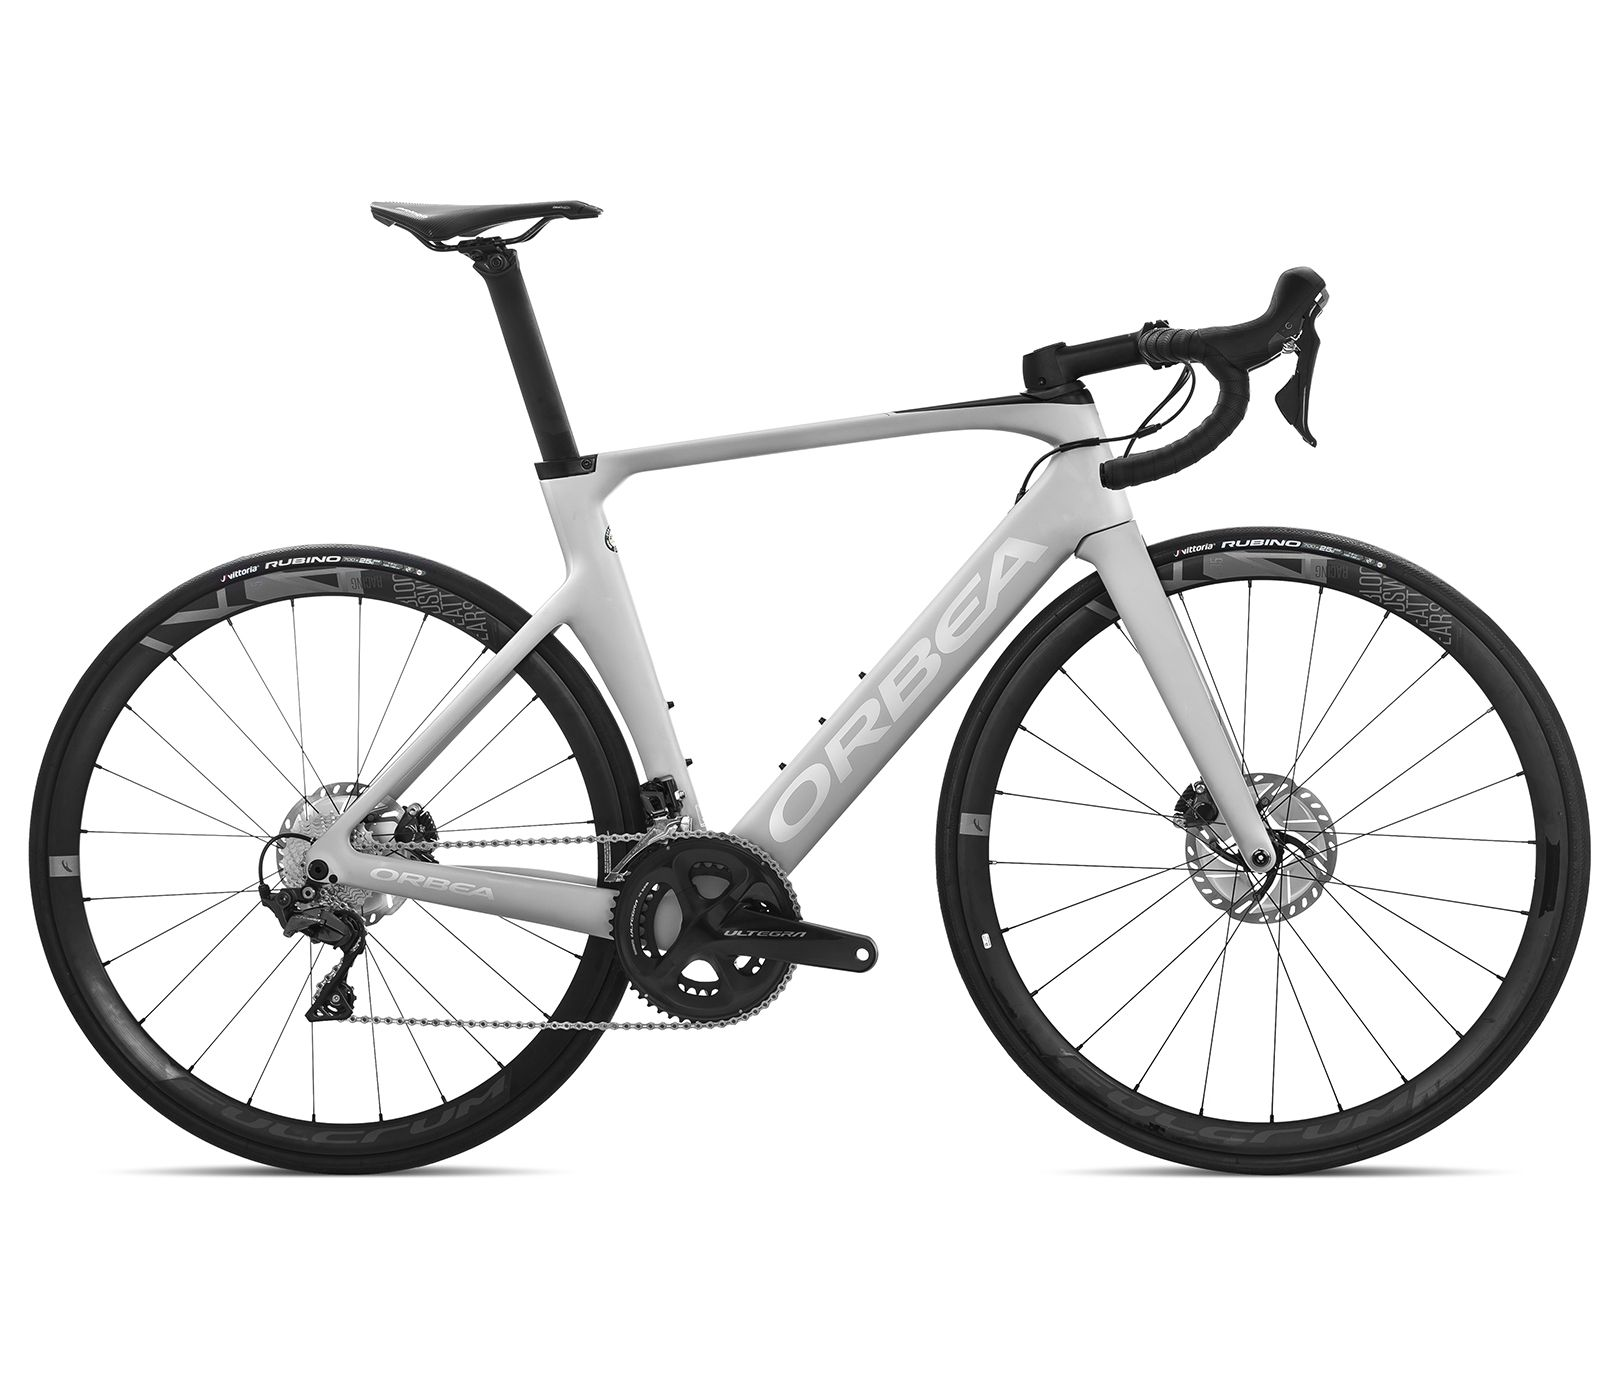 Orca Aero M20team D 19 Bicycle Cool Bikes Road Bikes